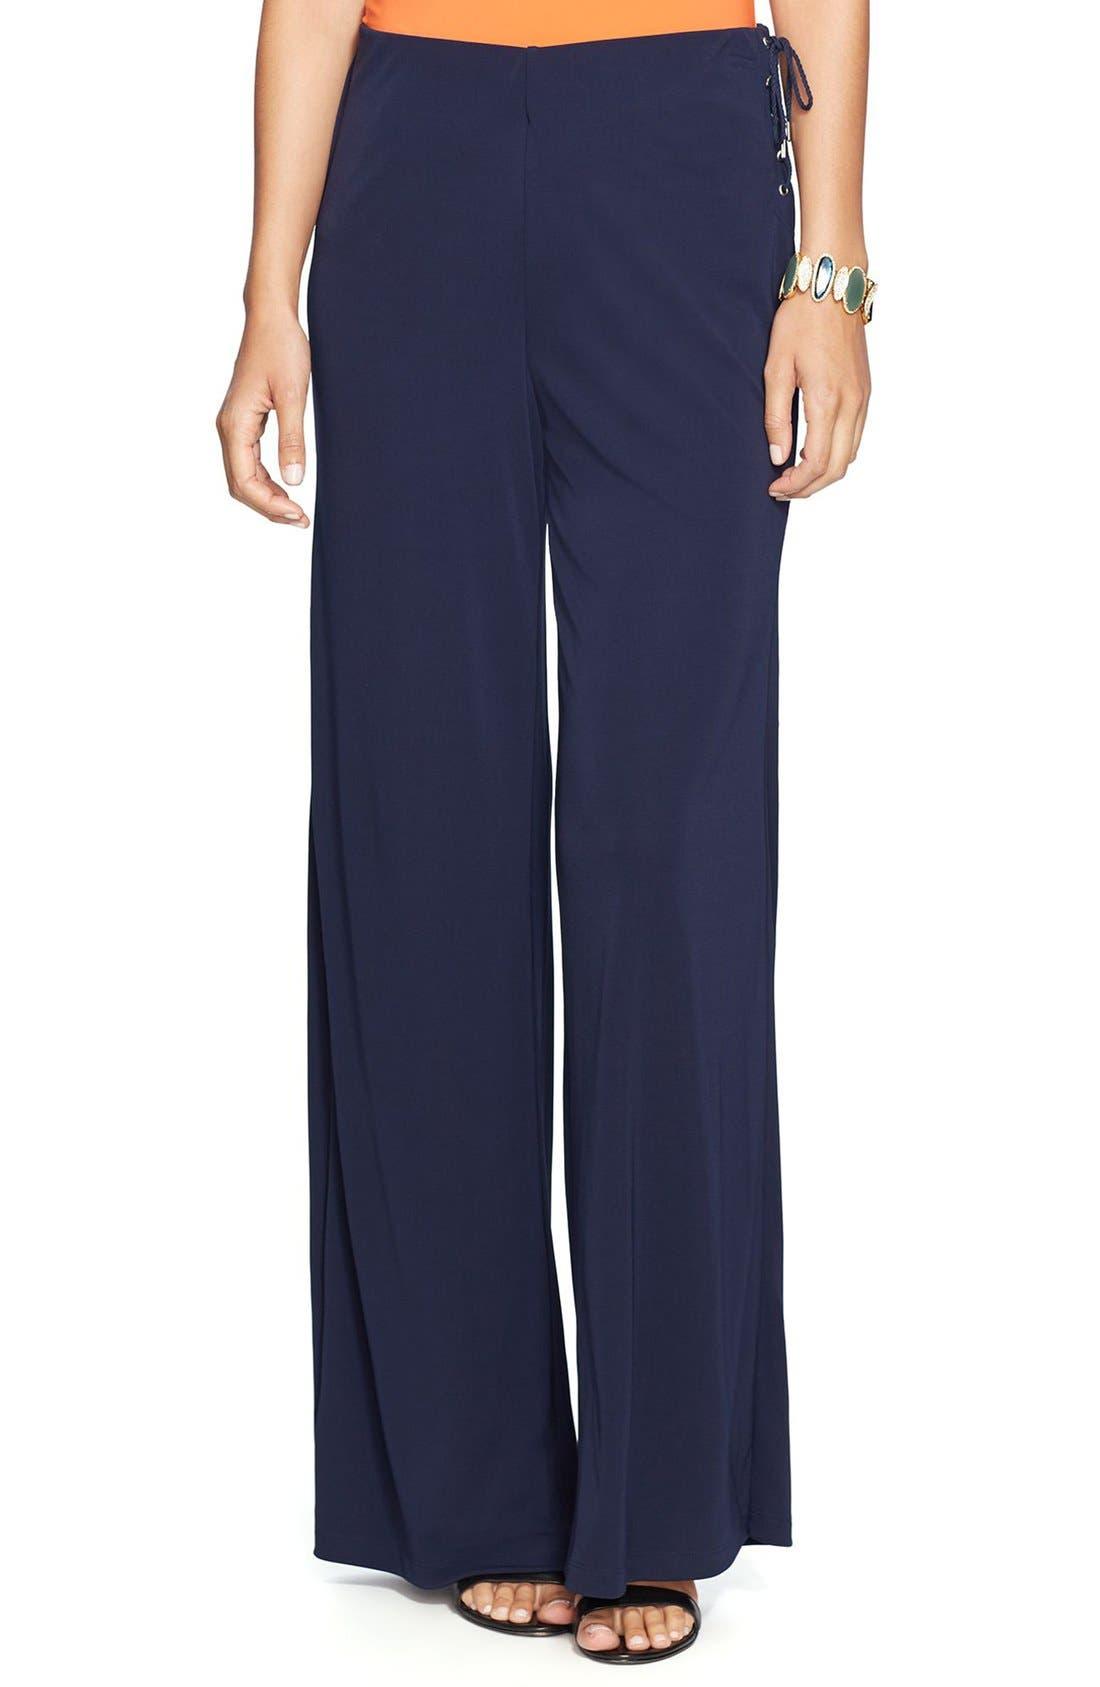 Alternate Image 1 Selected - Lauren Ralph Lauren Lace-Up Wide Leg Jersey Pants